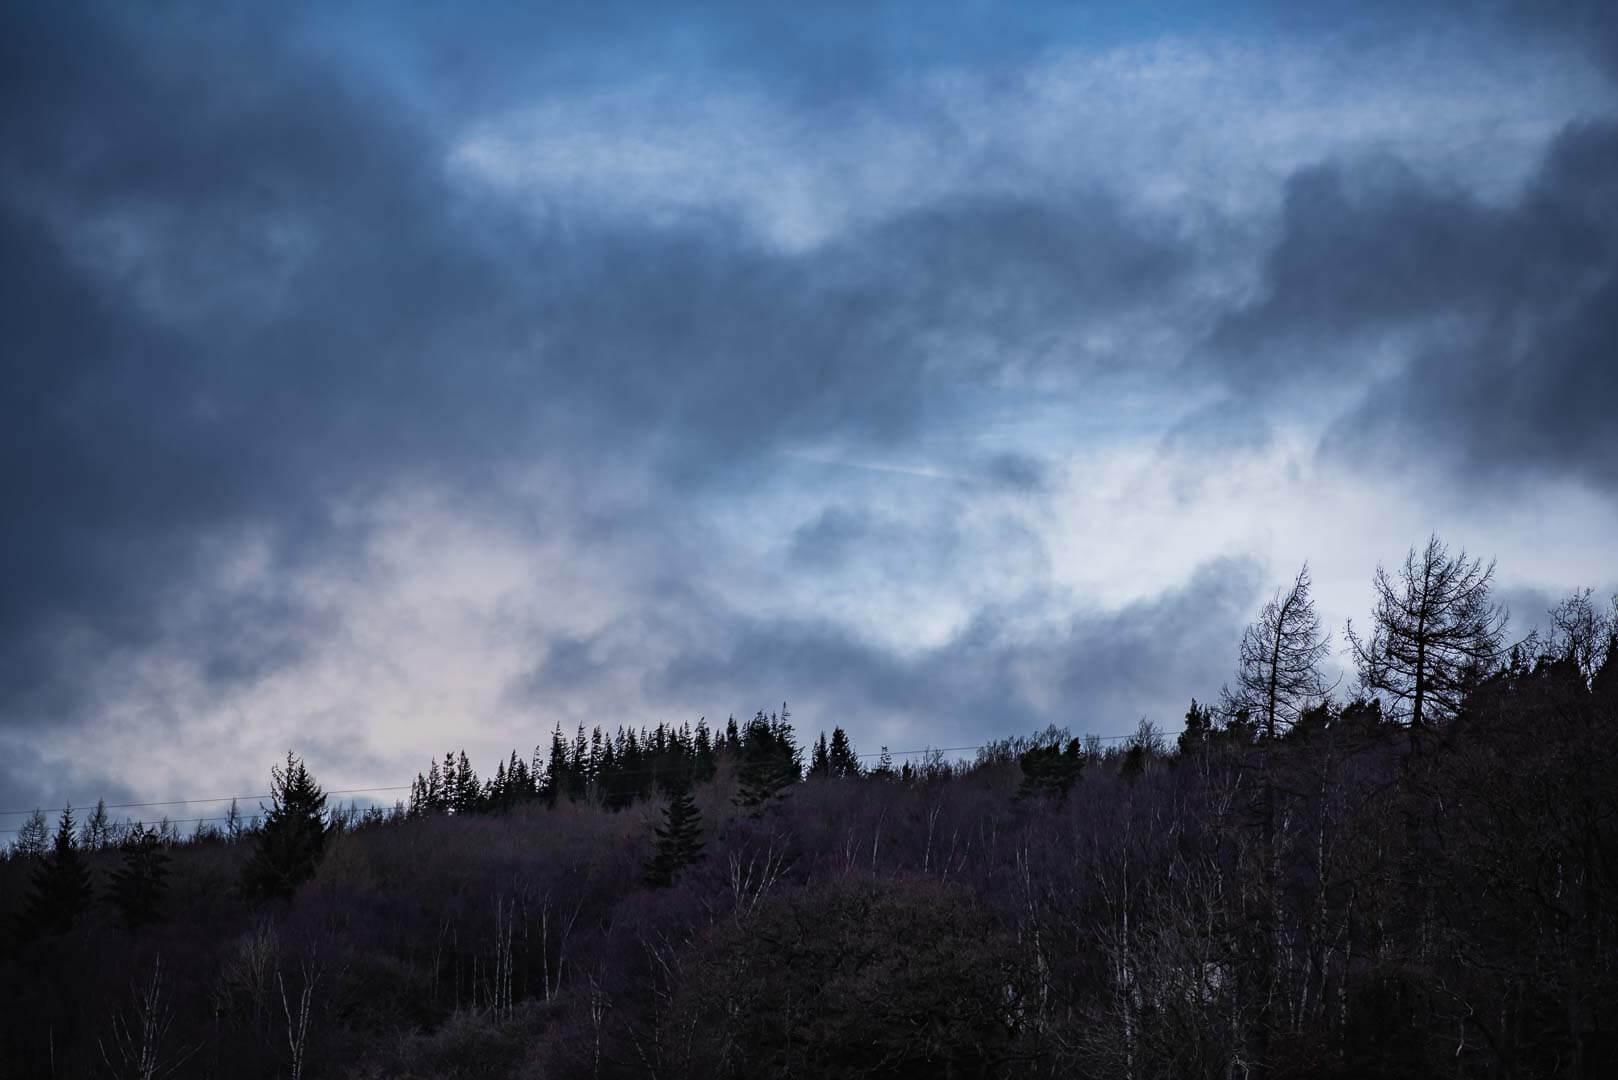 hamsterley forest moody sky